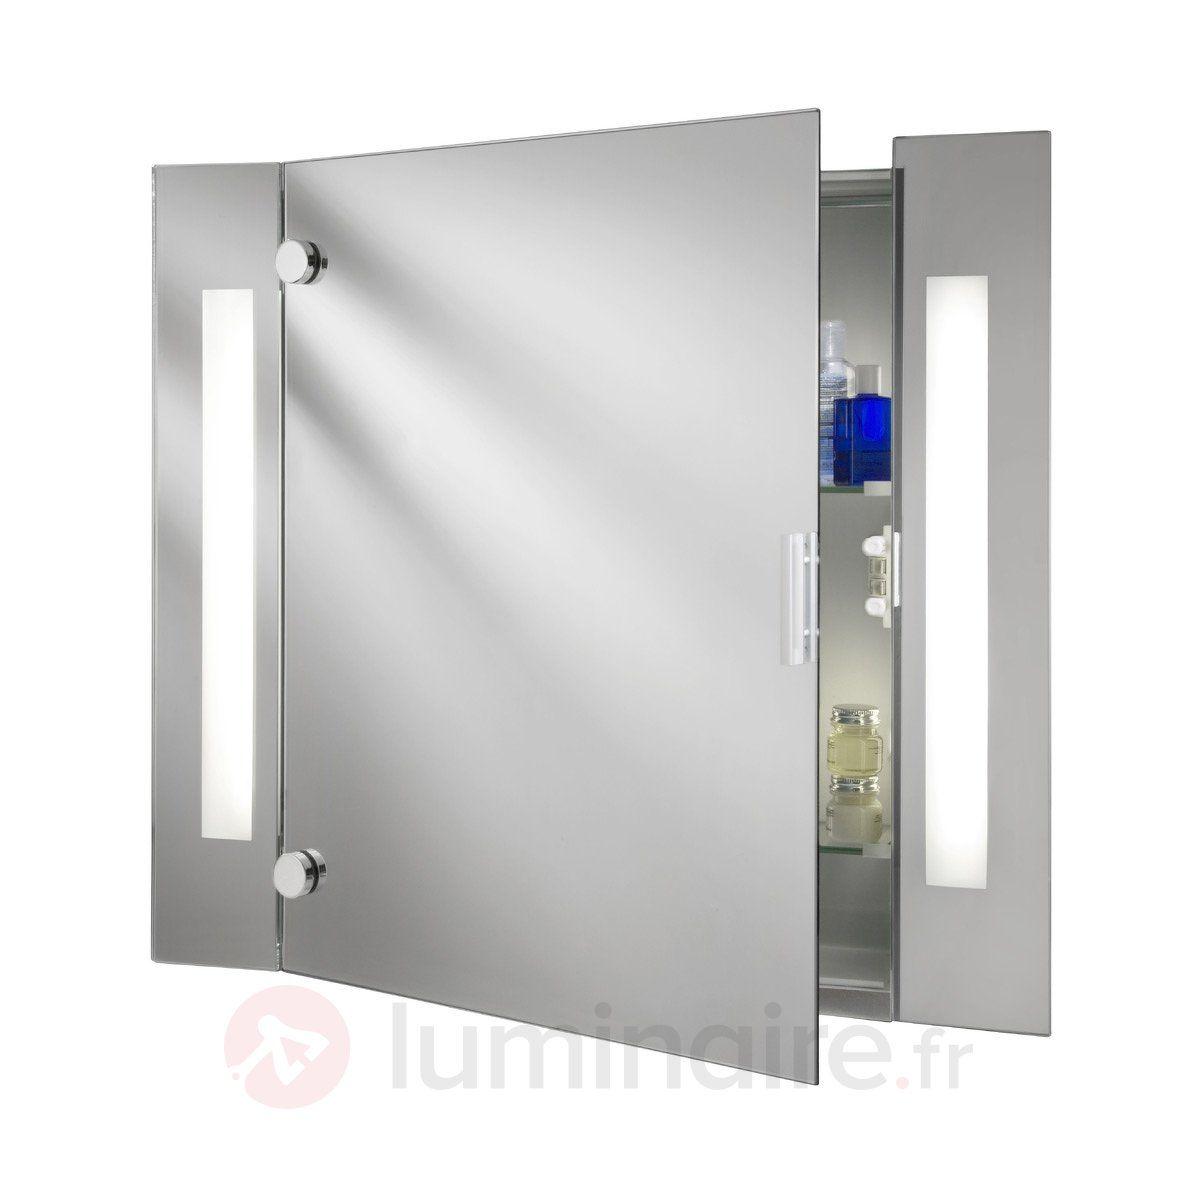 meuble miroir moderne silva avec clairage - Armoire De Salle De Bain Avec Miroir Et Lumiere